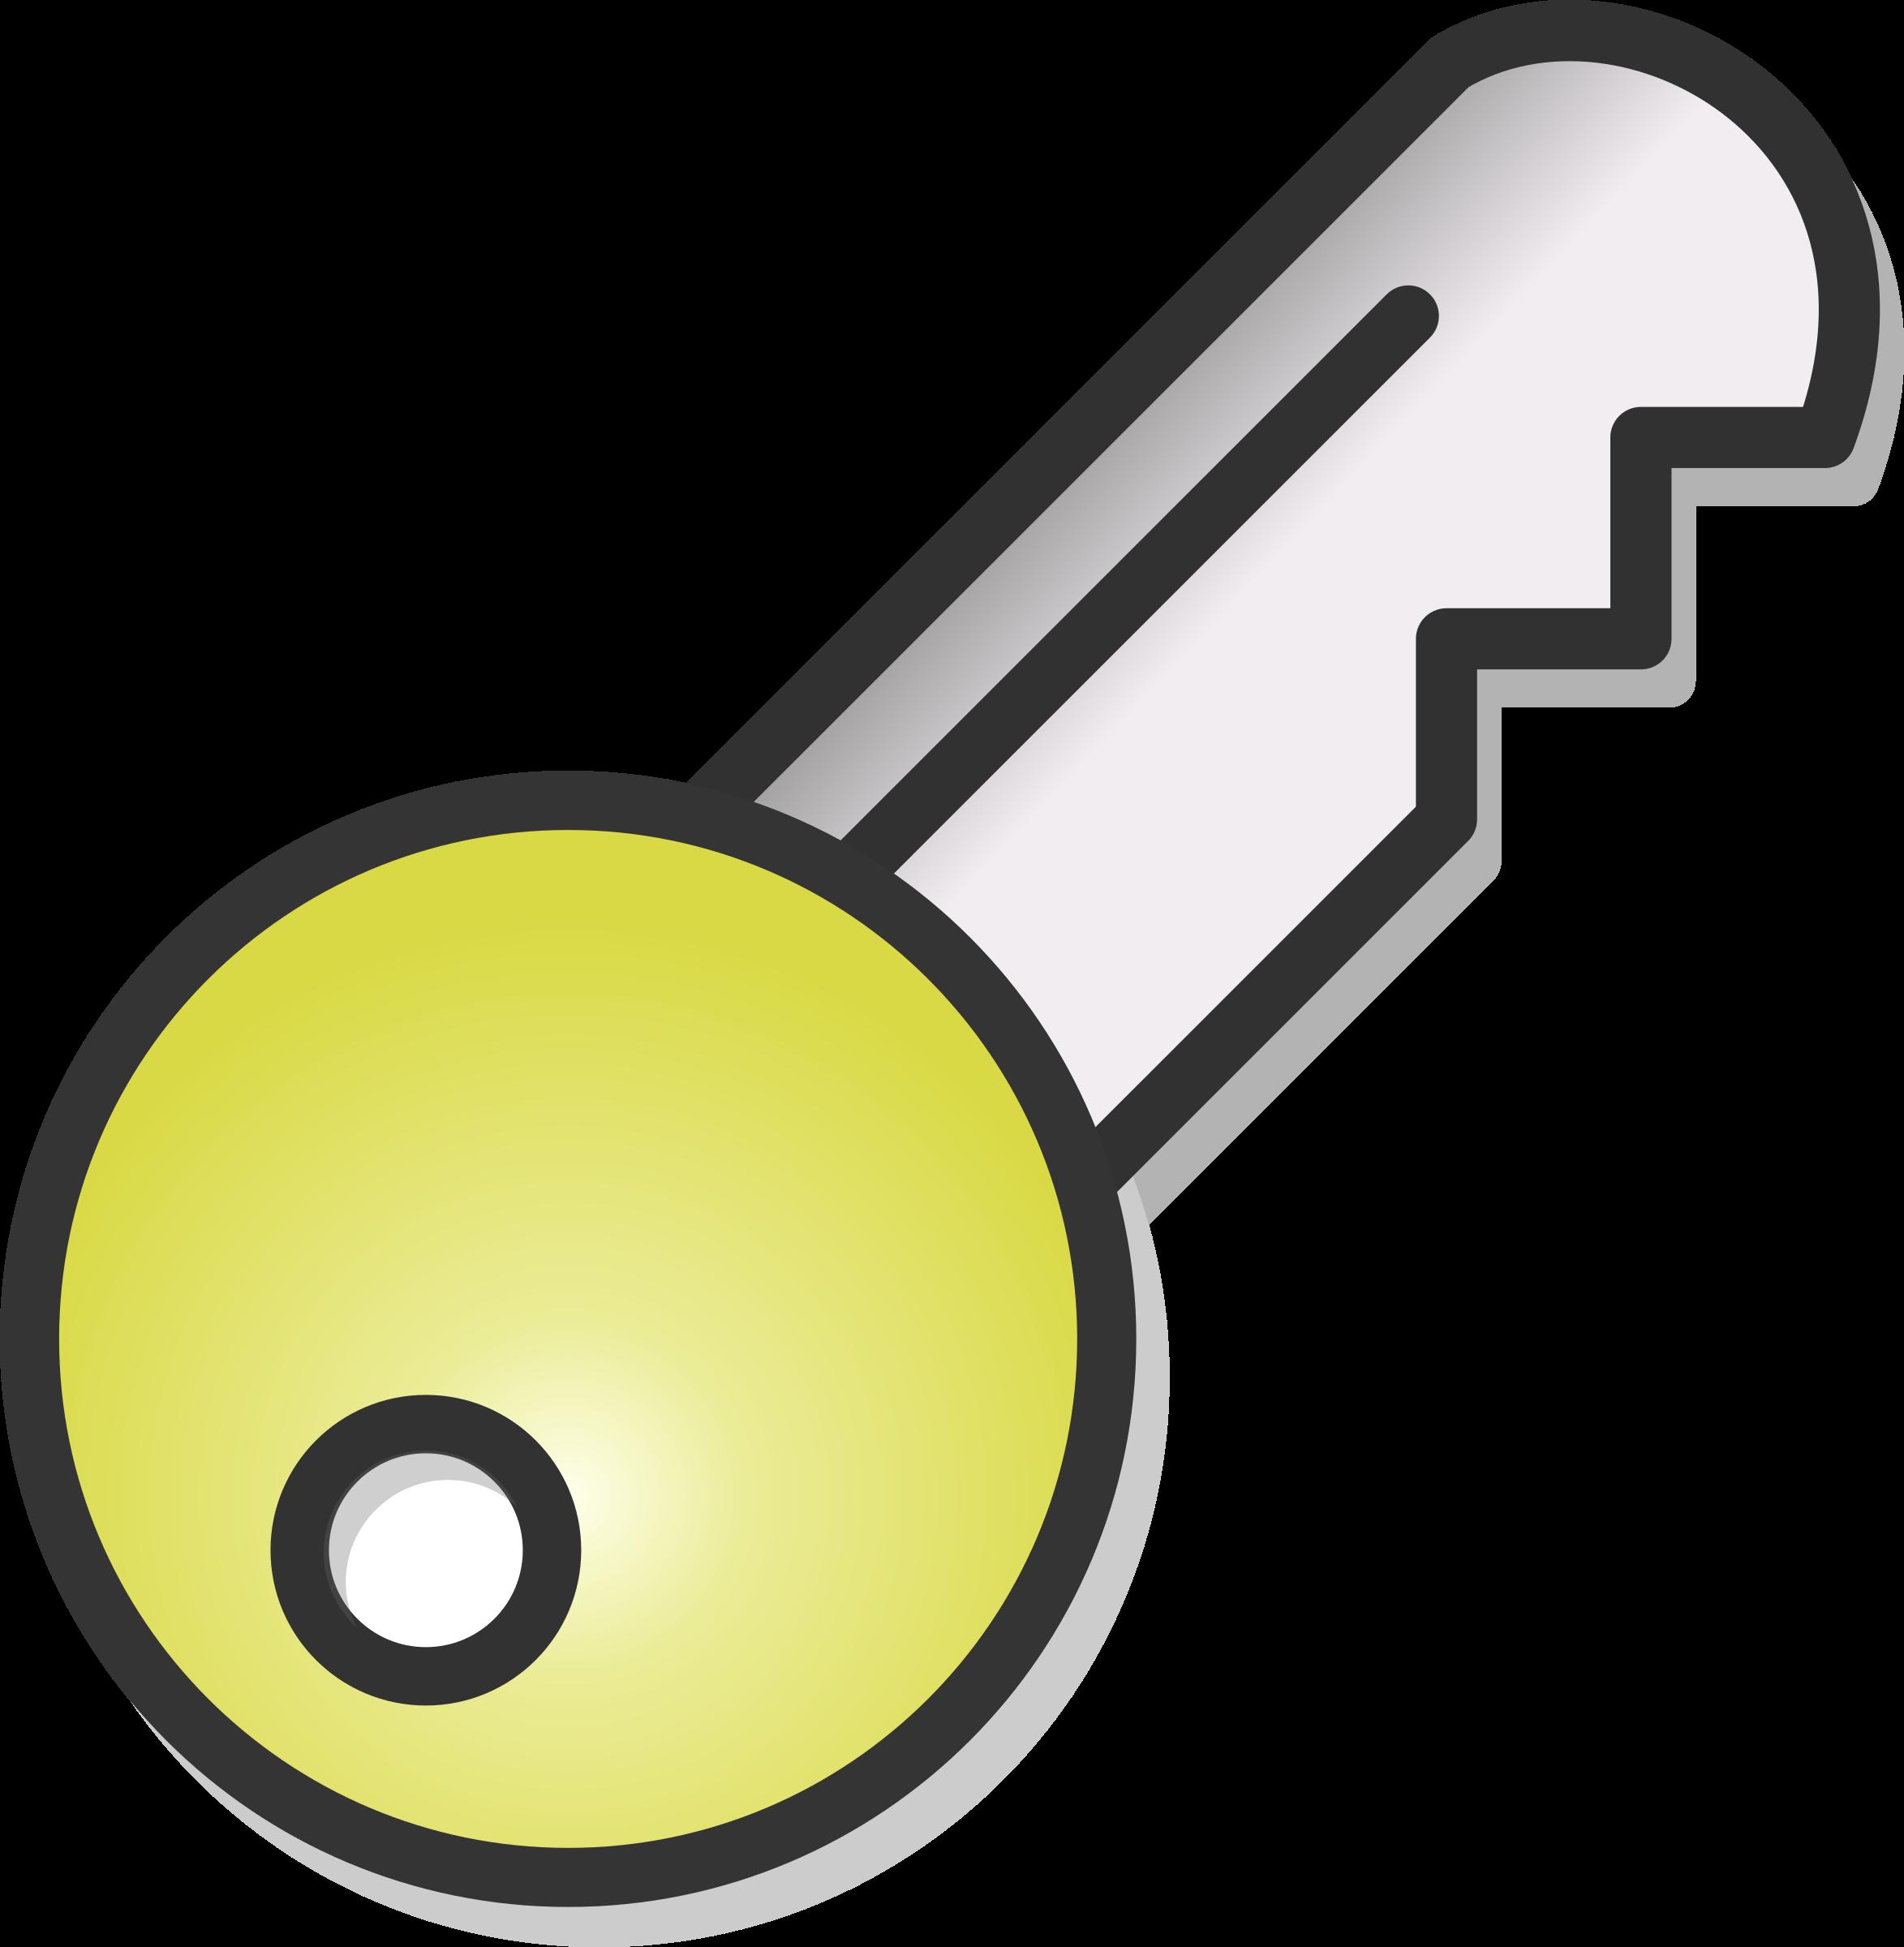 Keys clipart purple. Key big image png